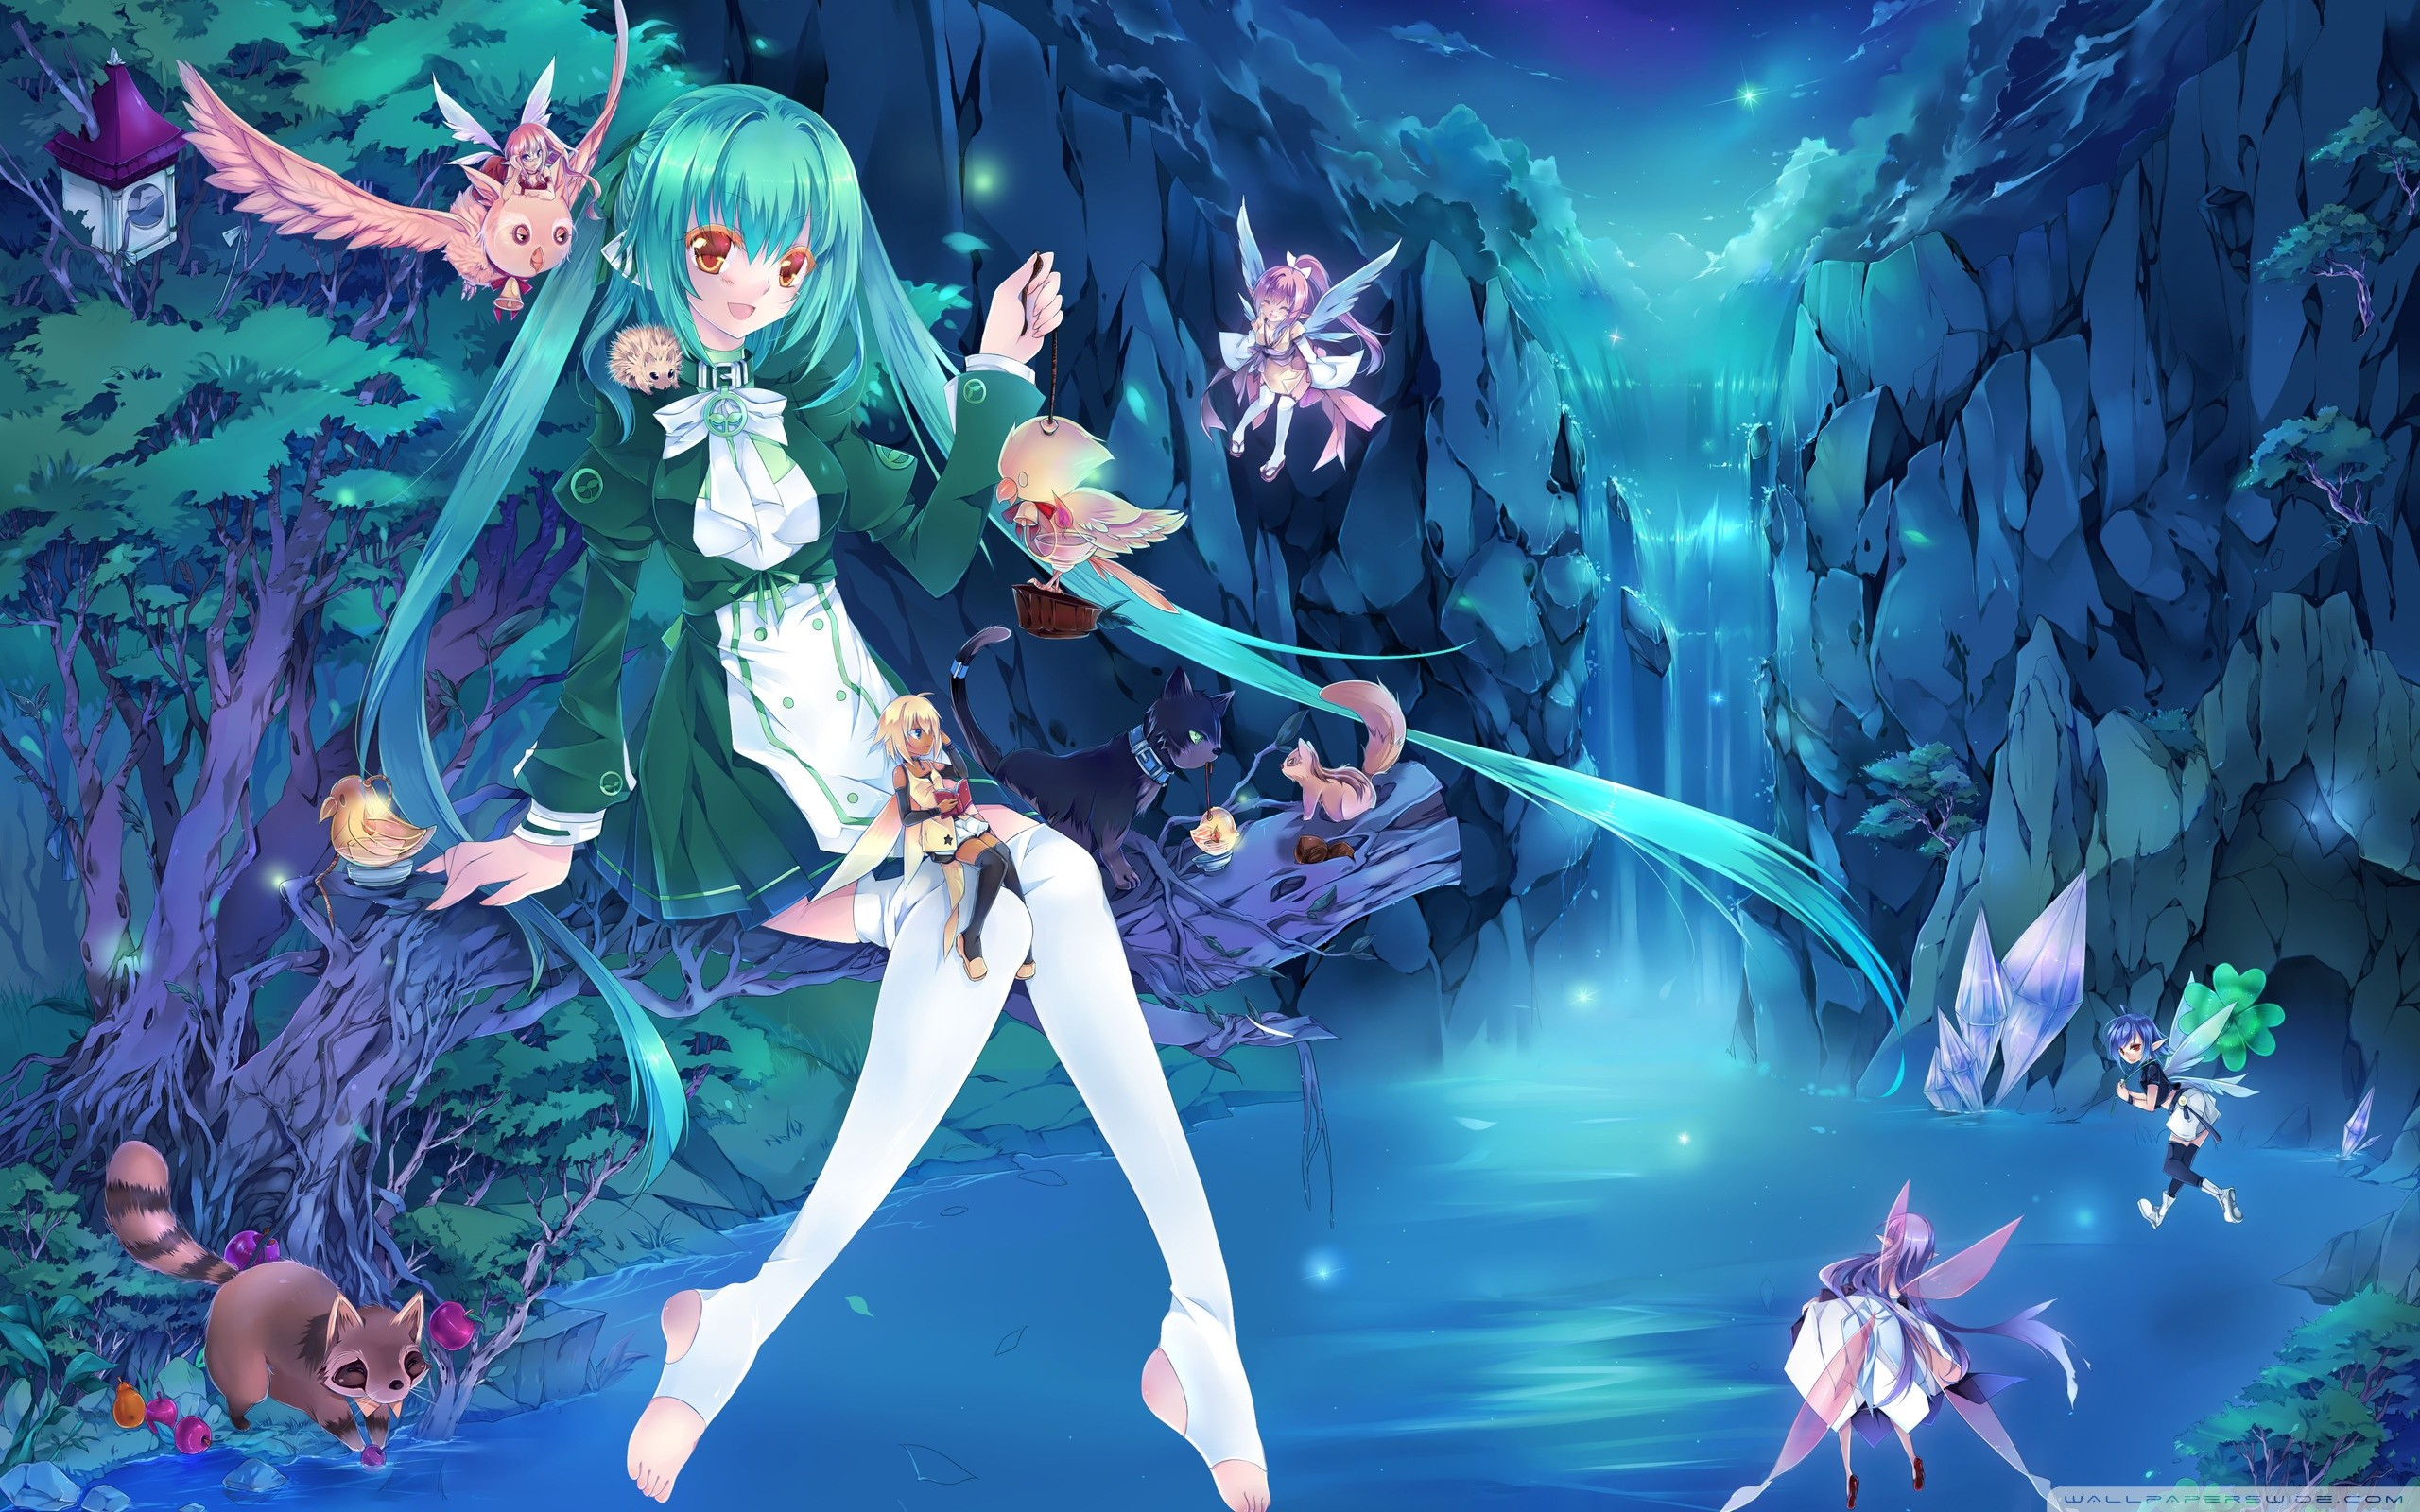 Res: 2560x1600, Anime Fairies HD desktop wallpaper : High Definition : Mobile